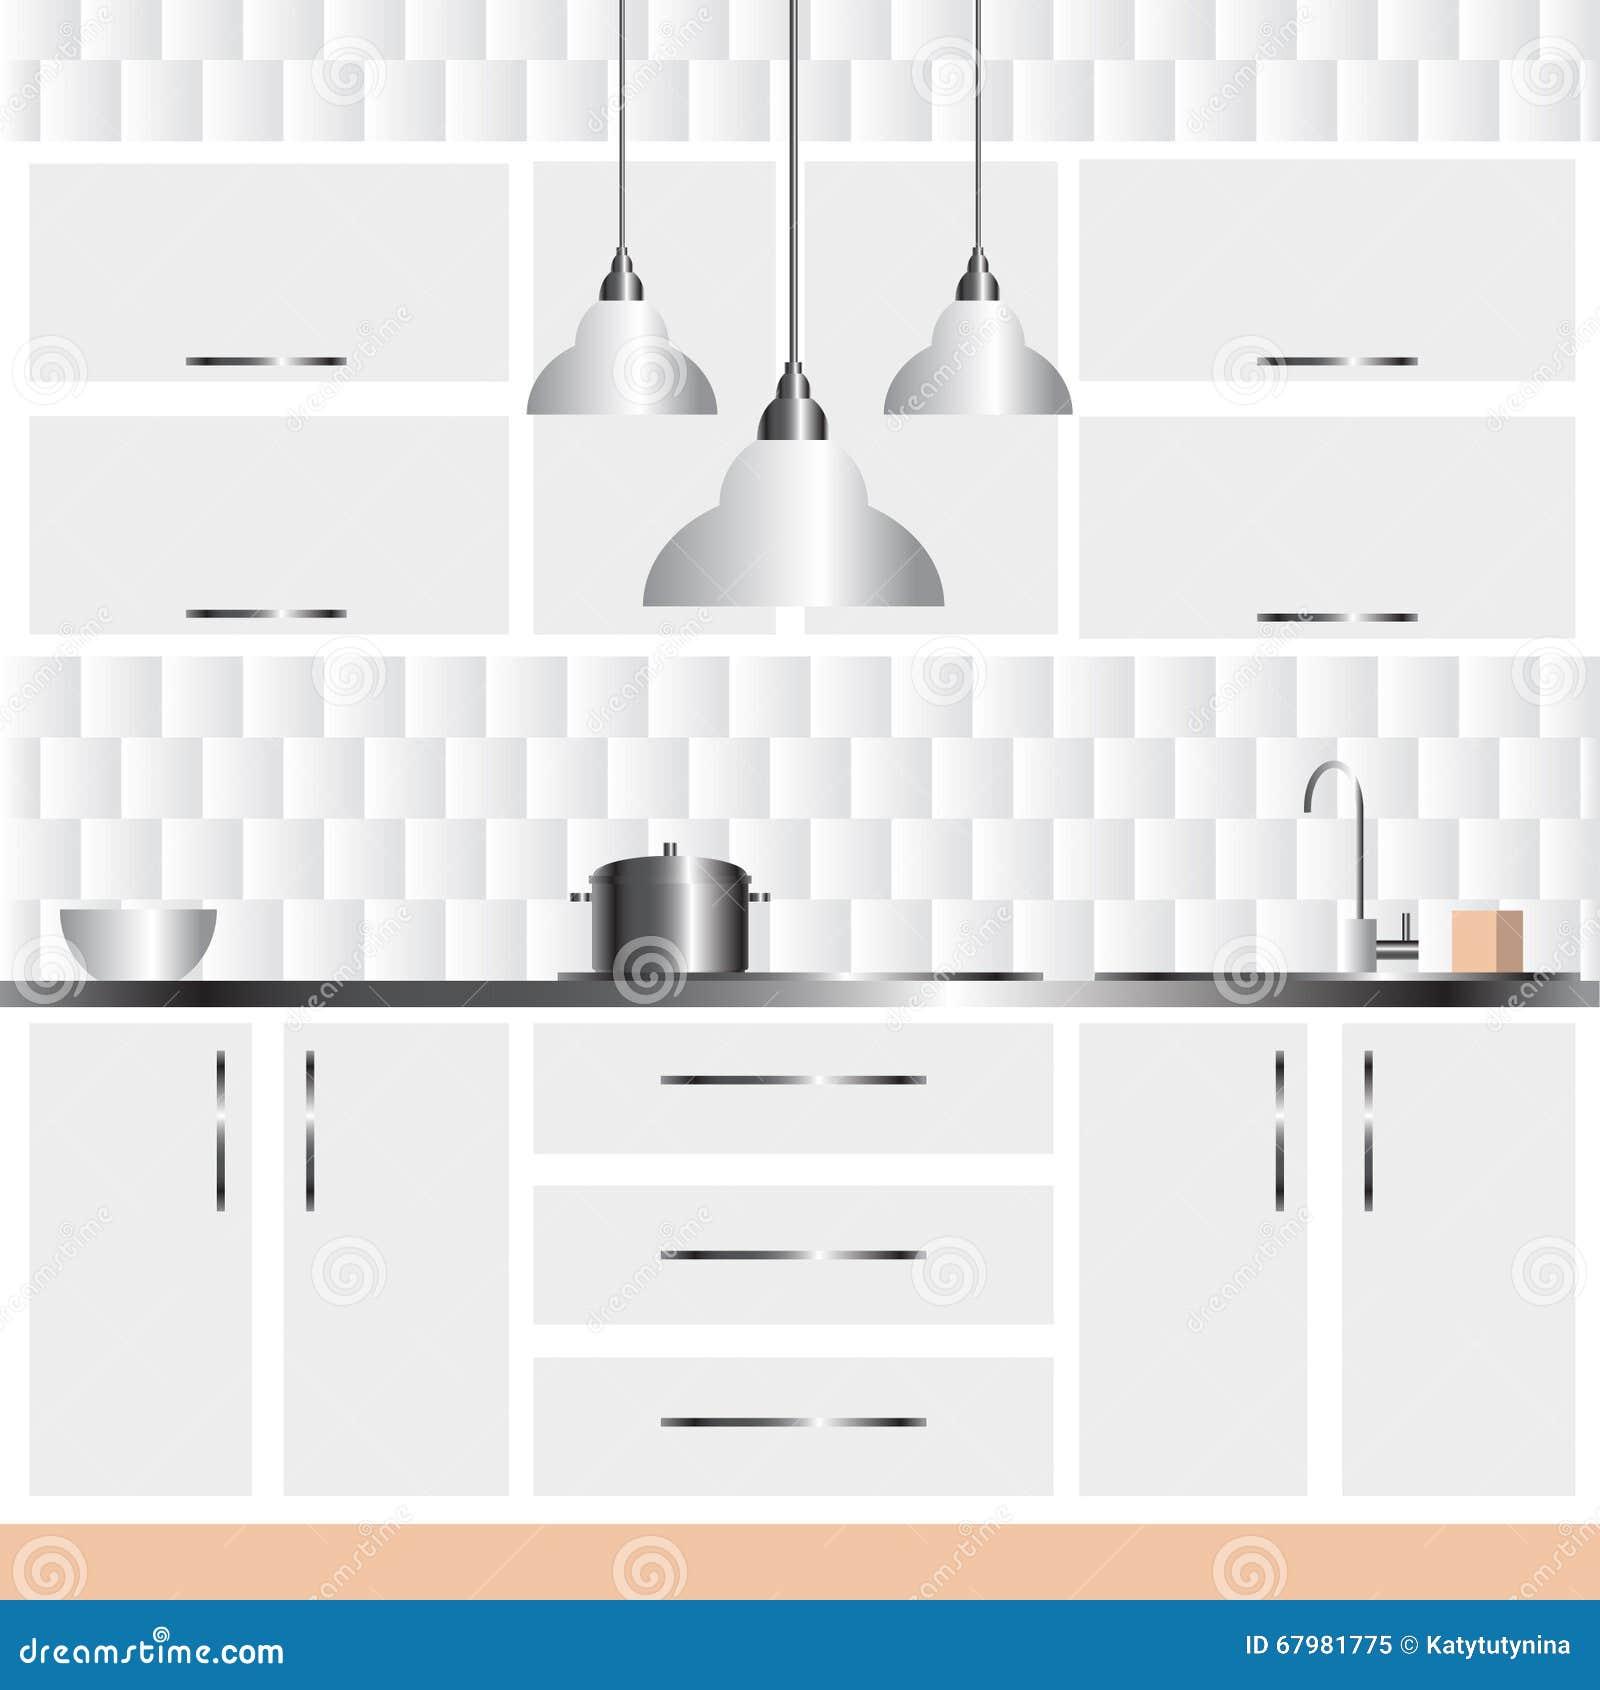 Illustration Of Modern Kitchen Interior Design Stock Vector Illustration Of Gradient